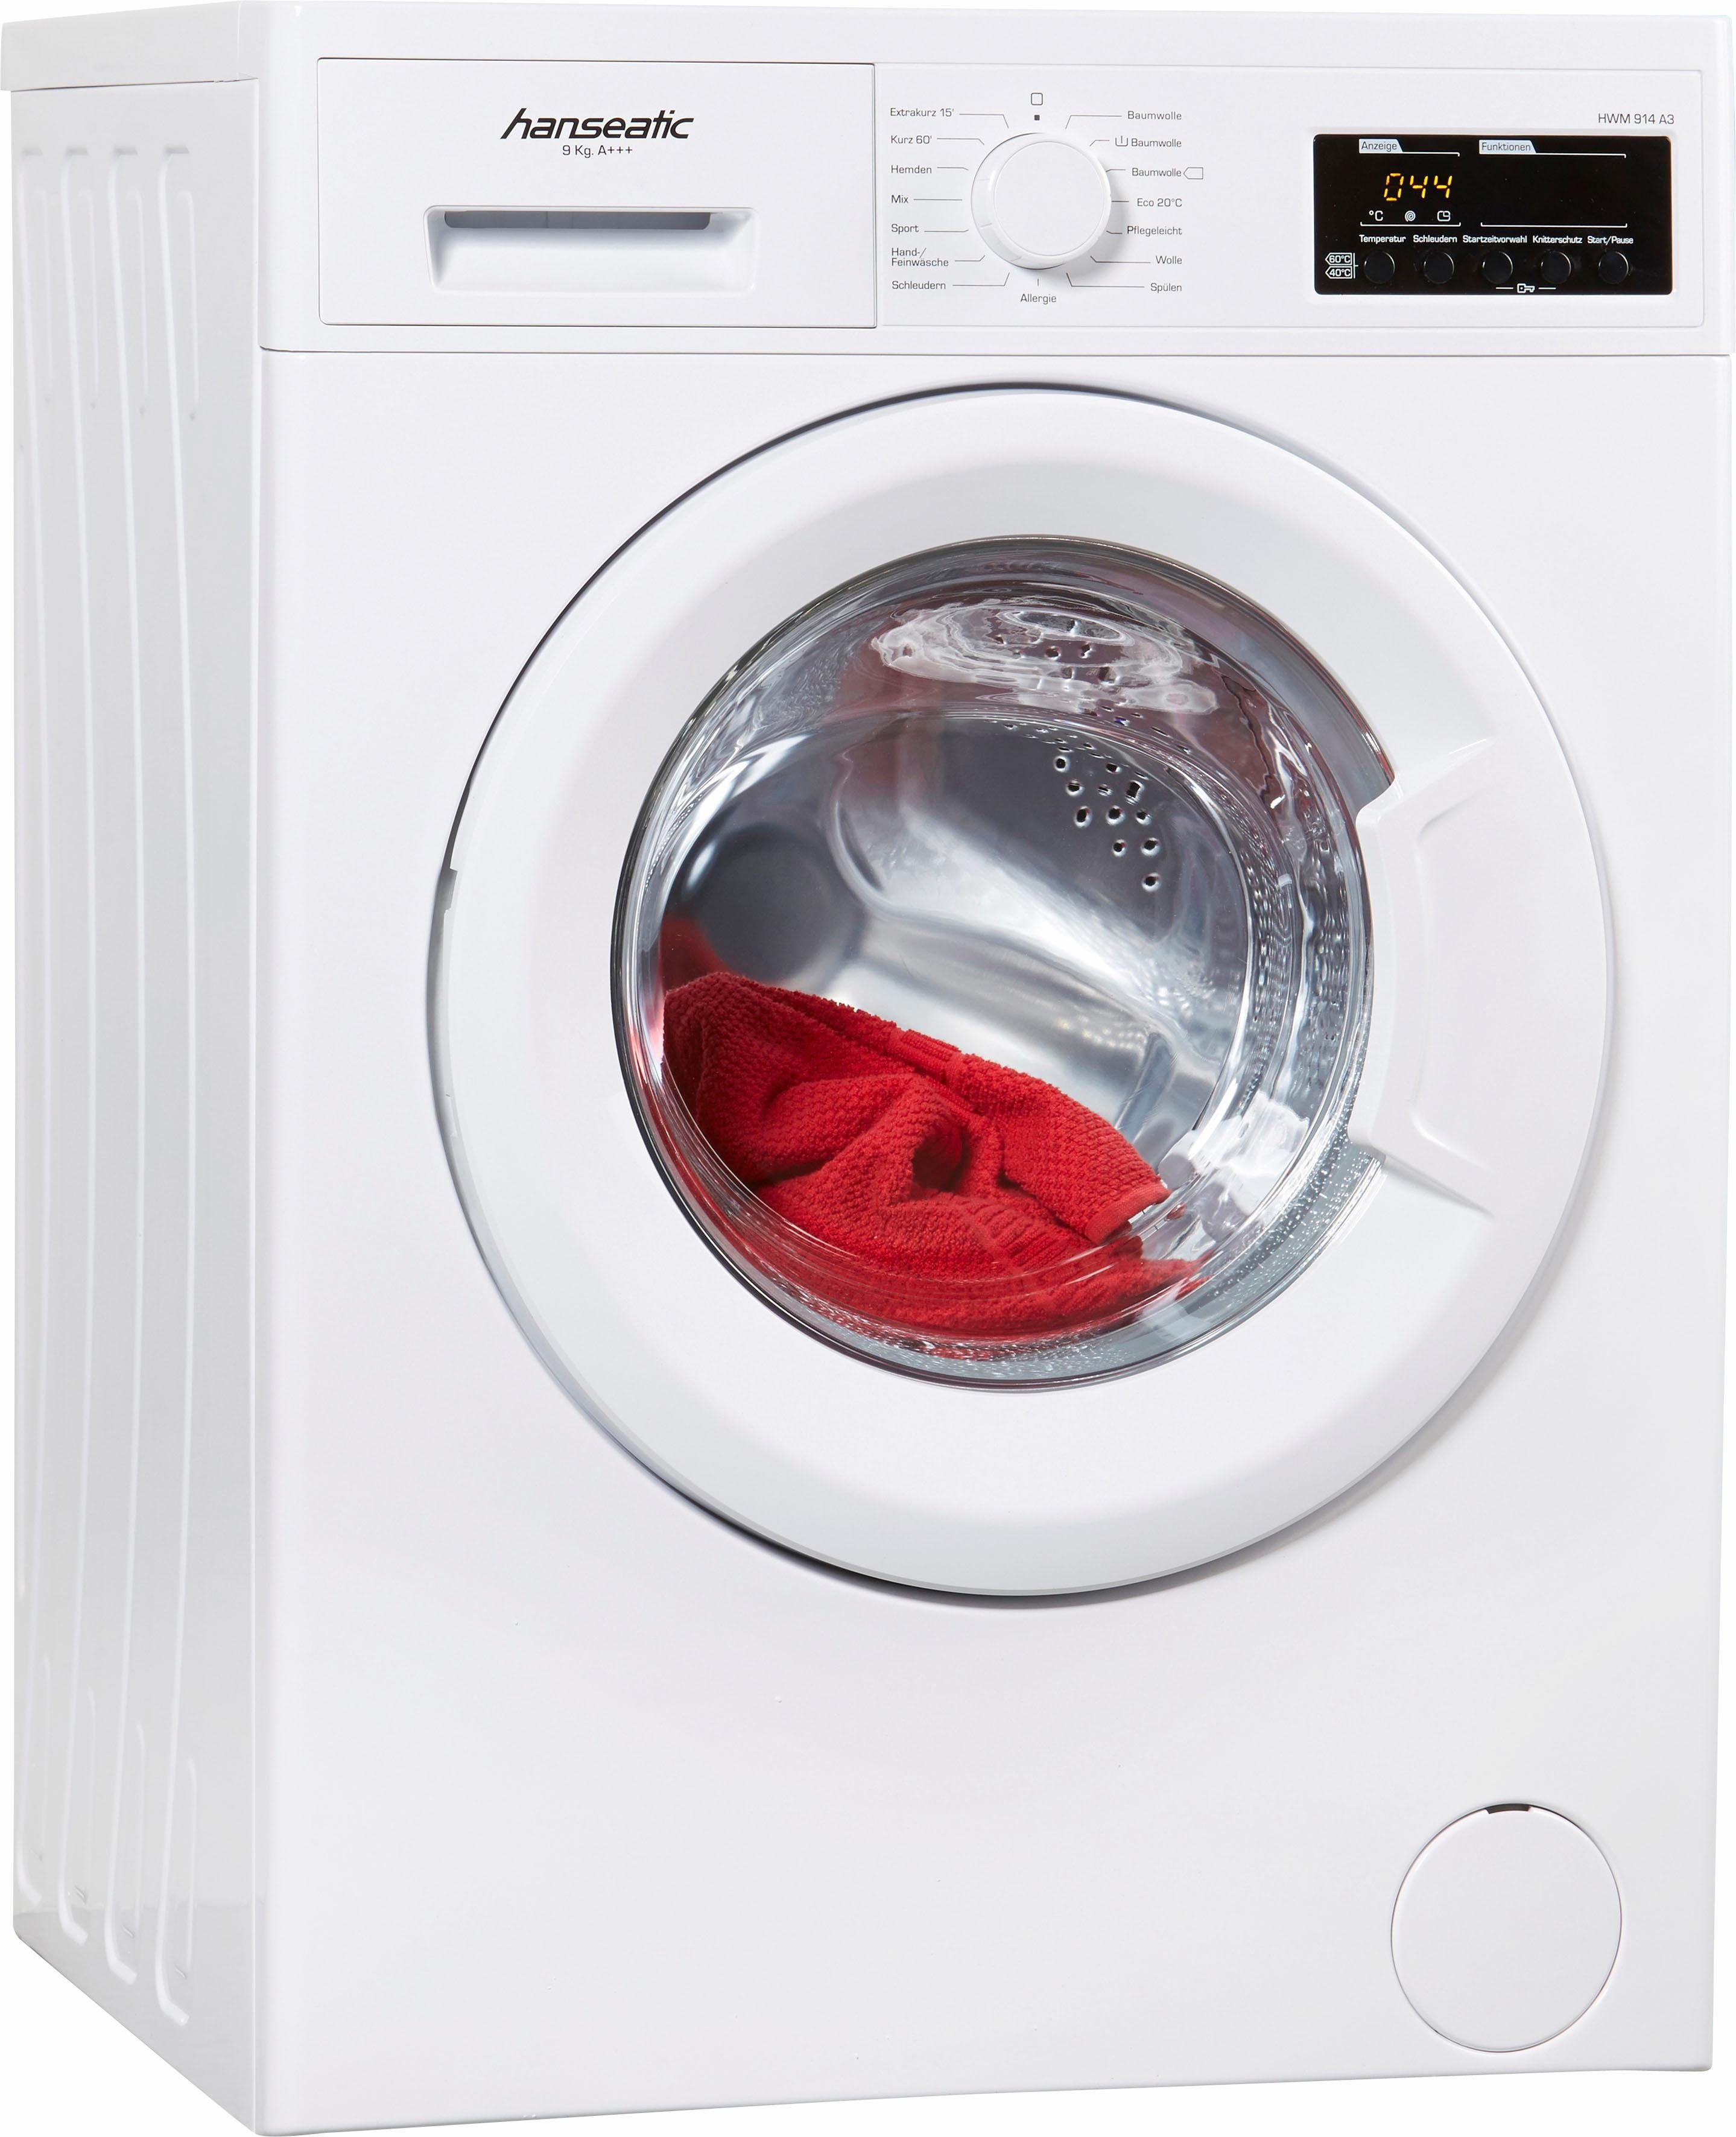 Hanseatic Waschmaschine HWM 914 A3, 9 kg, 1400 U/Min